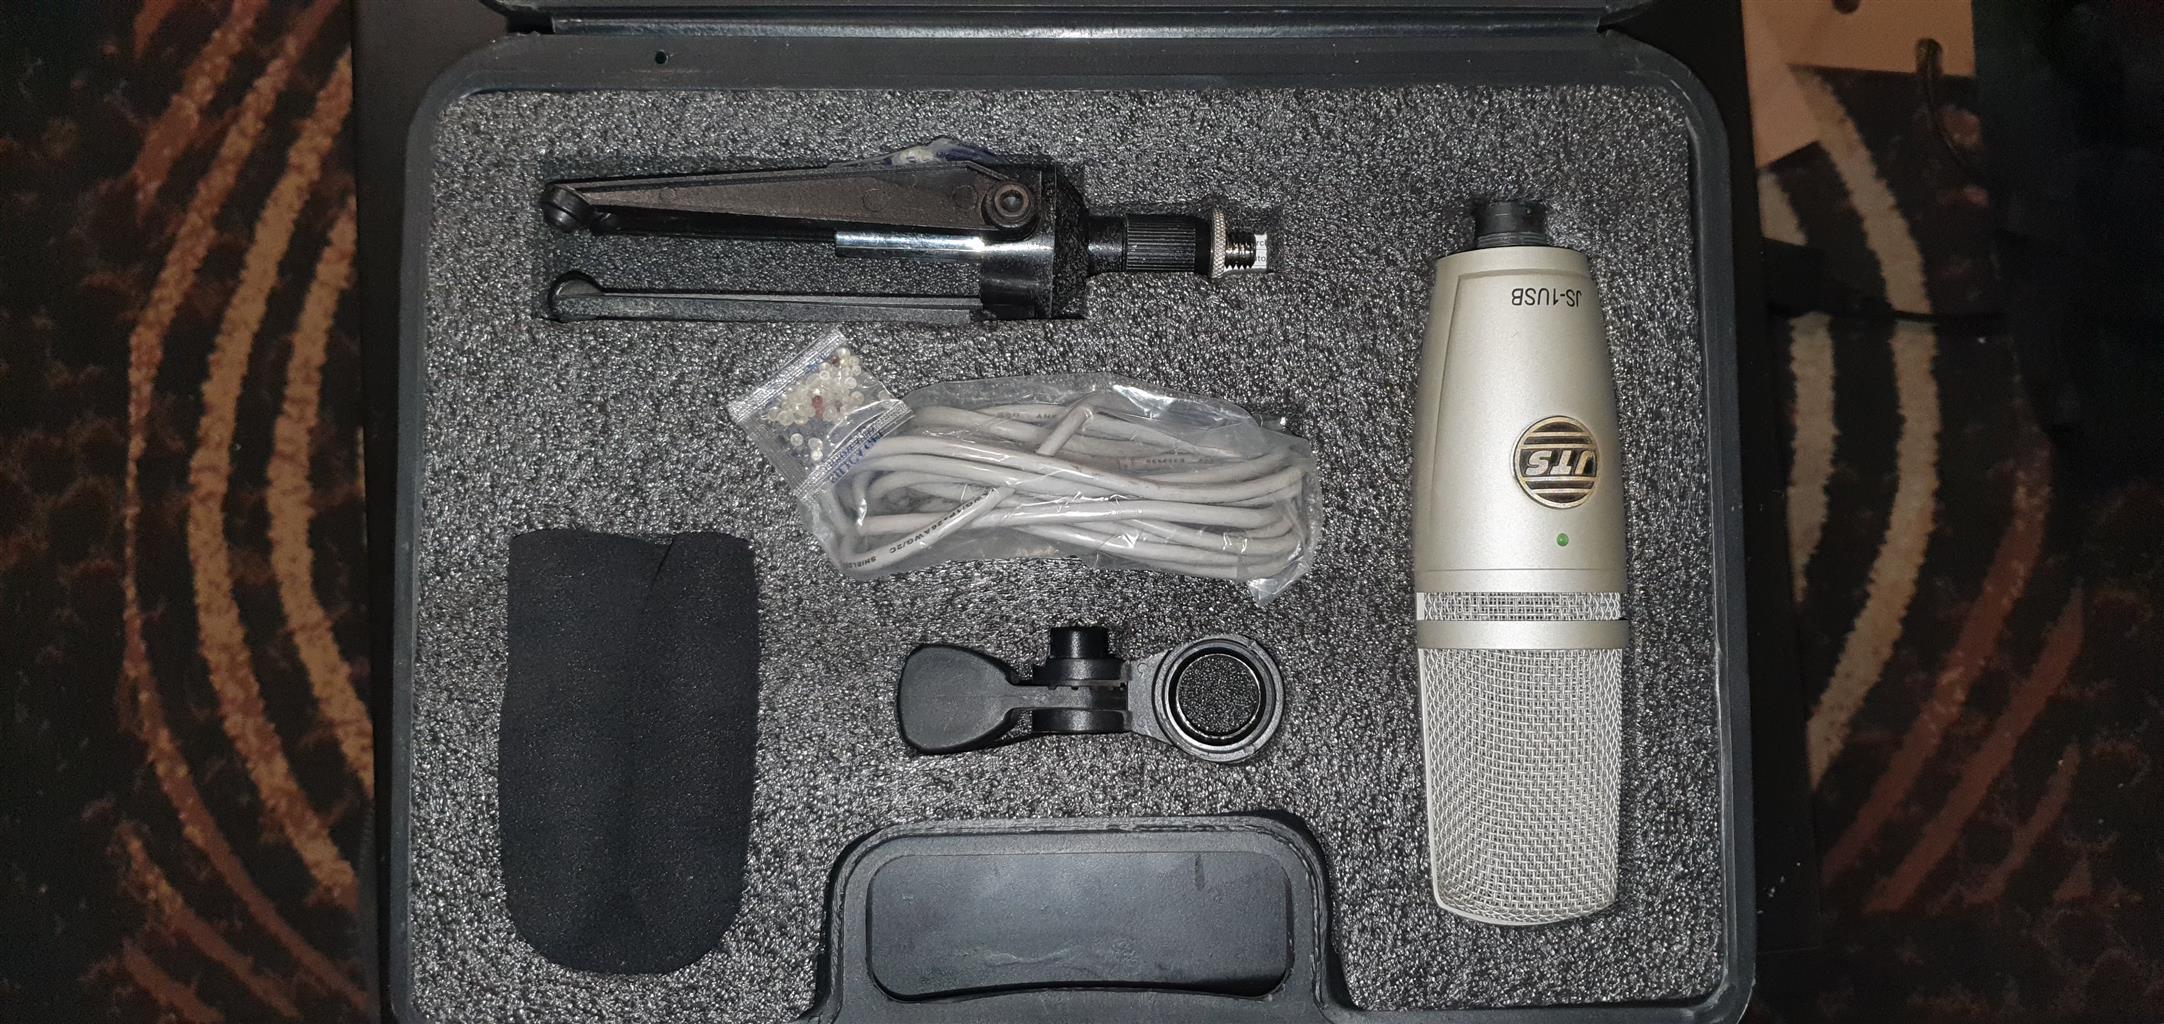 JTS condenser studio microphone